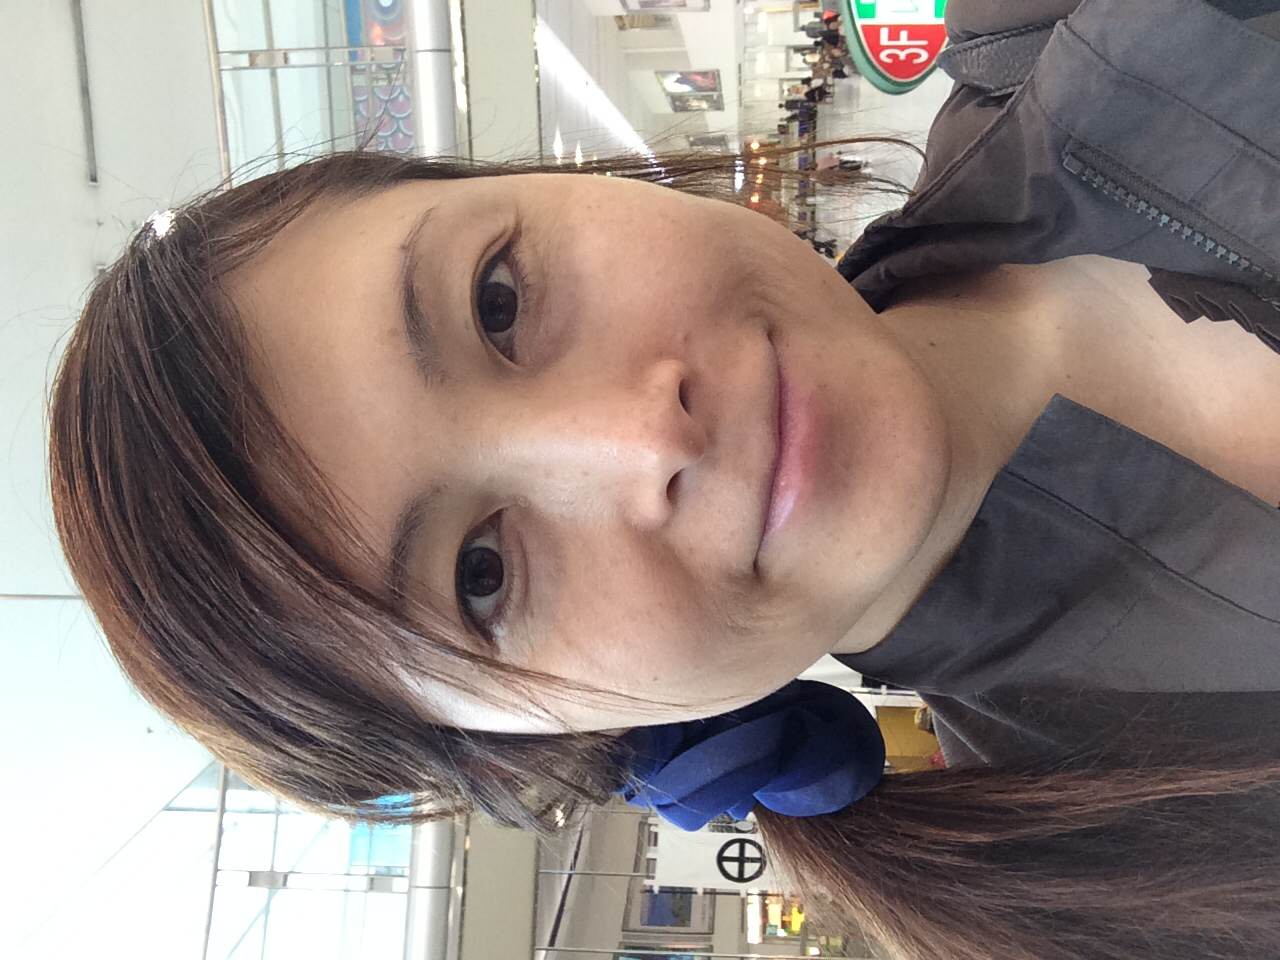 1/2014042813323700-photo1-small.jpg